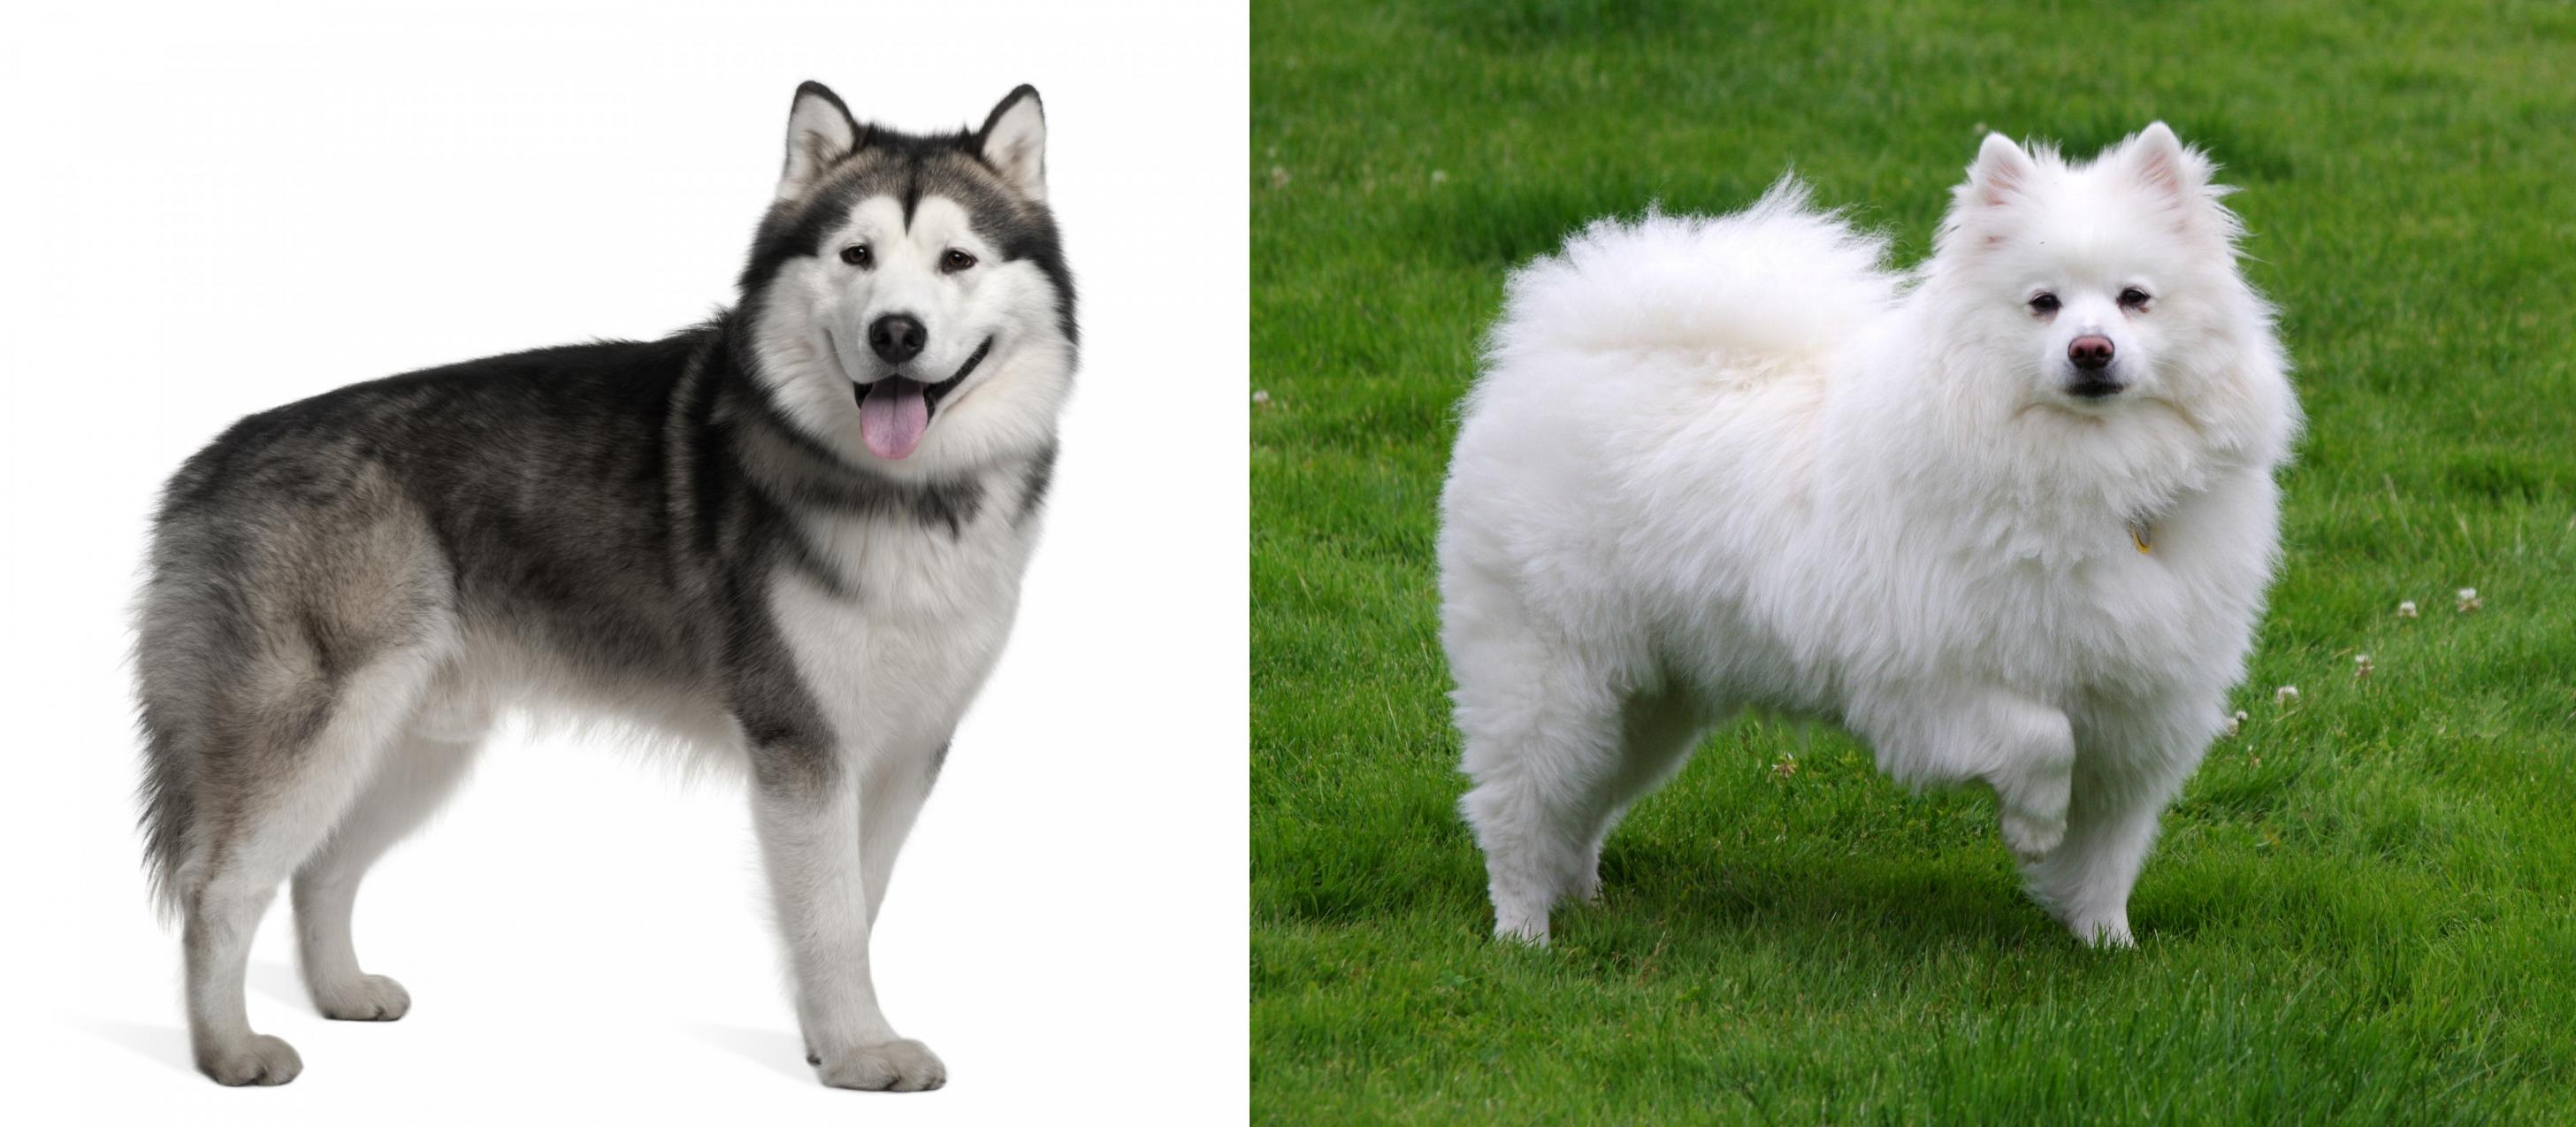 Alaskan Malamute Vs American Eskimo Dog